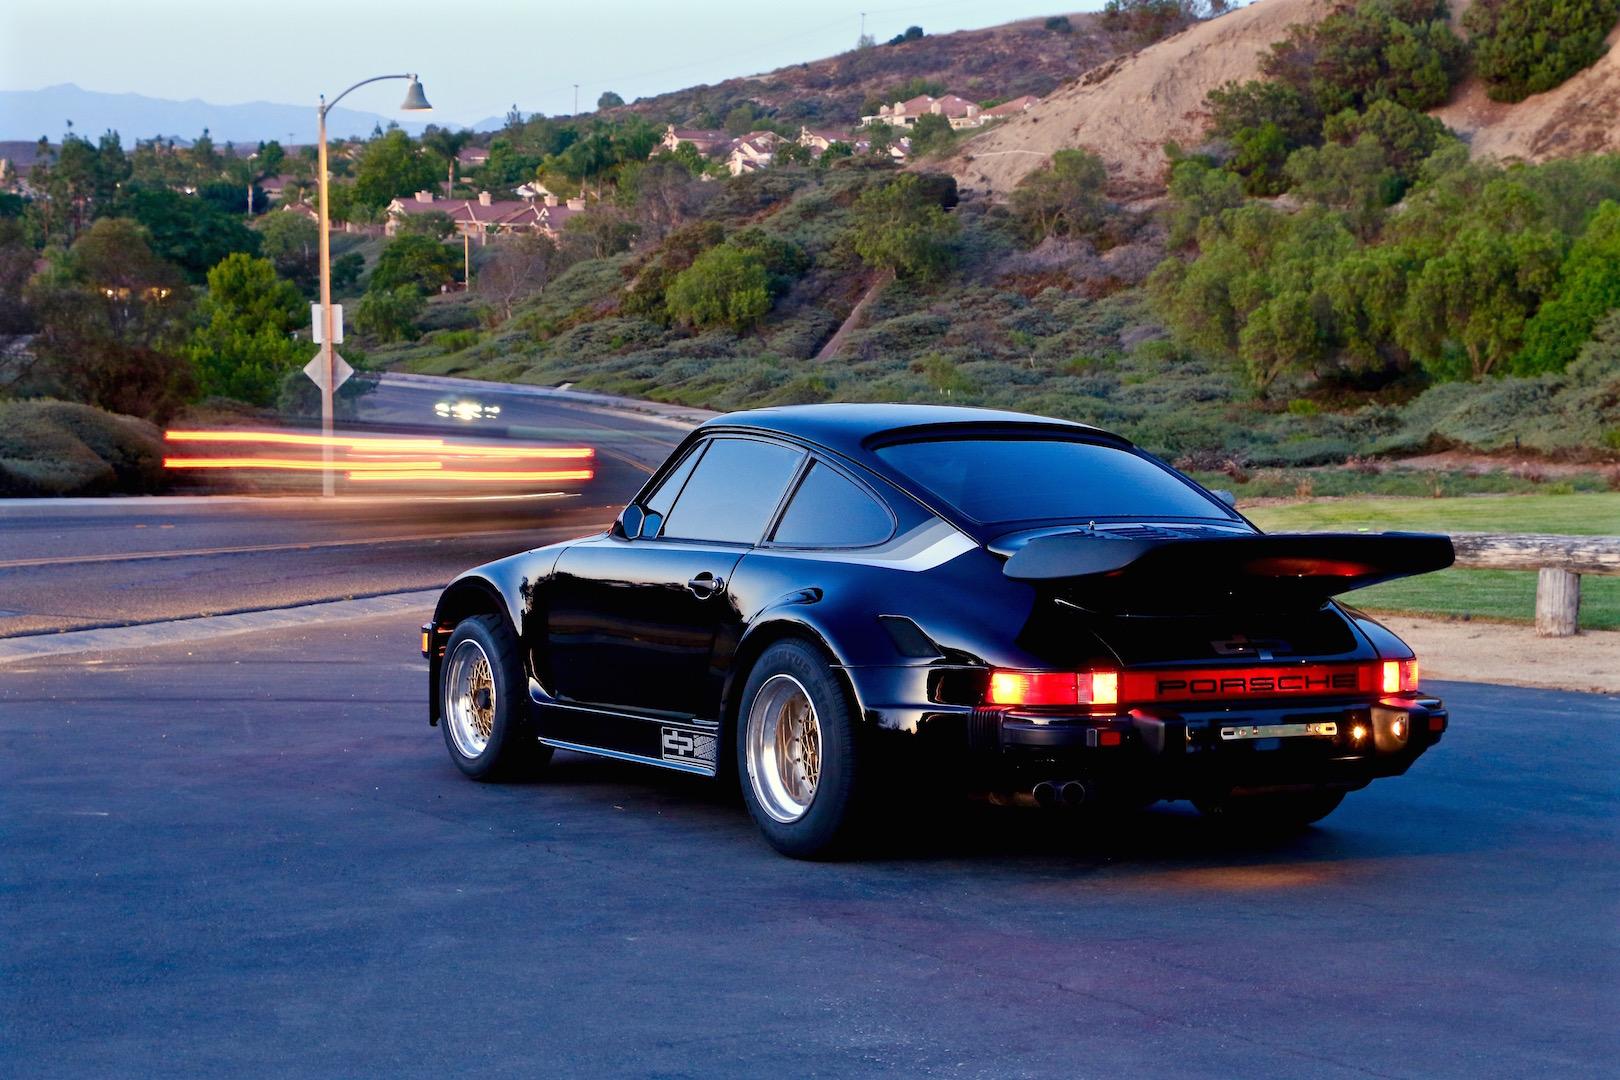 1980s Porsche Kremer in California.